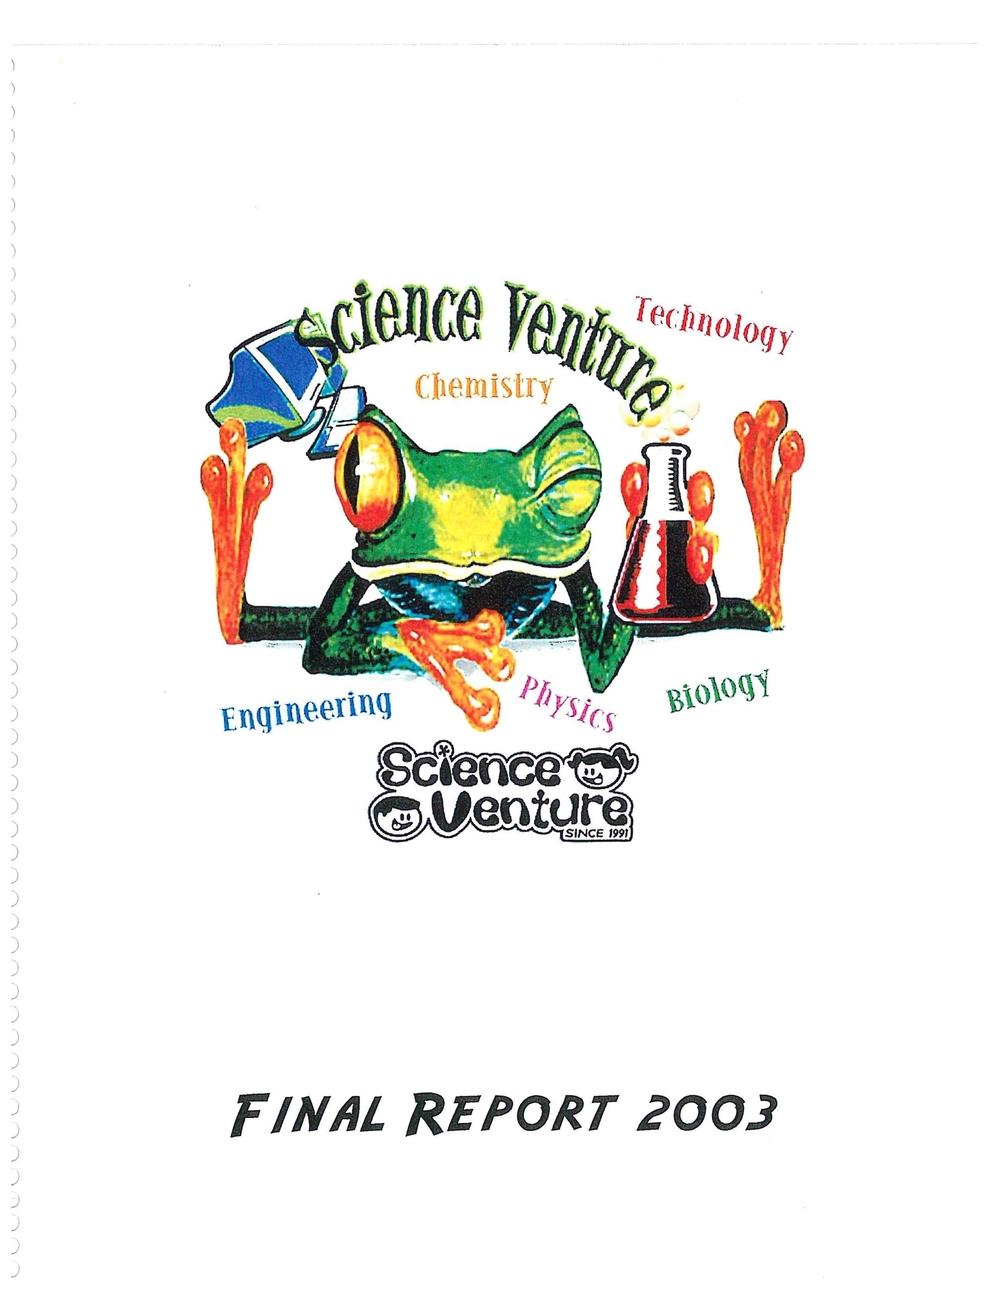 Final_Report_2003.jpg